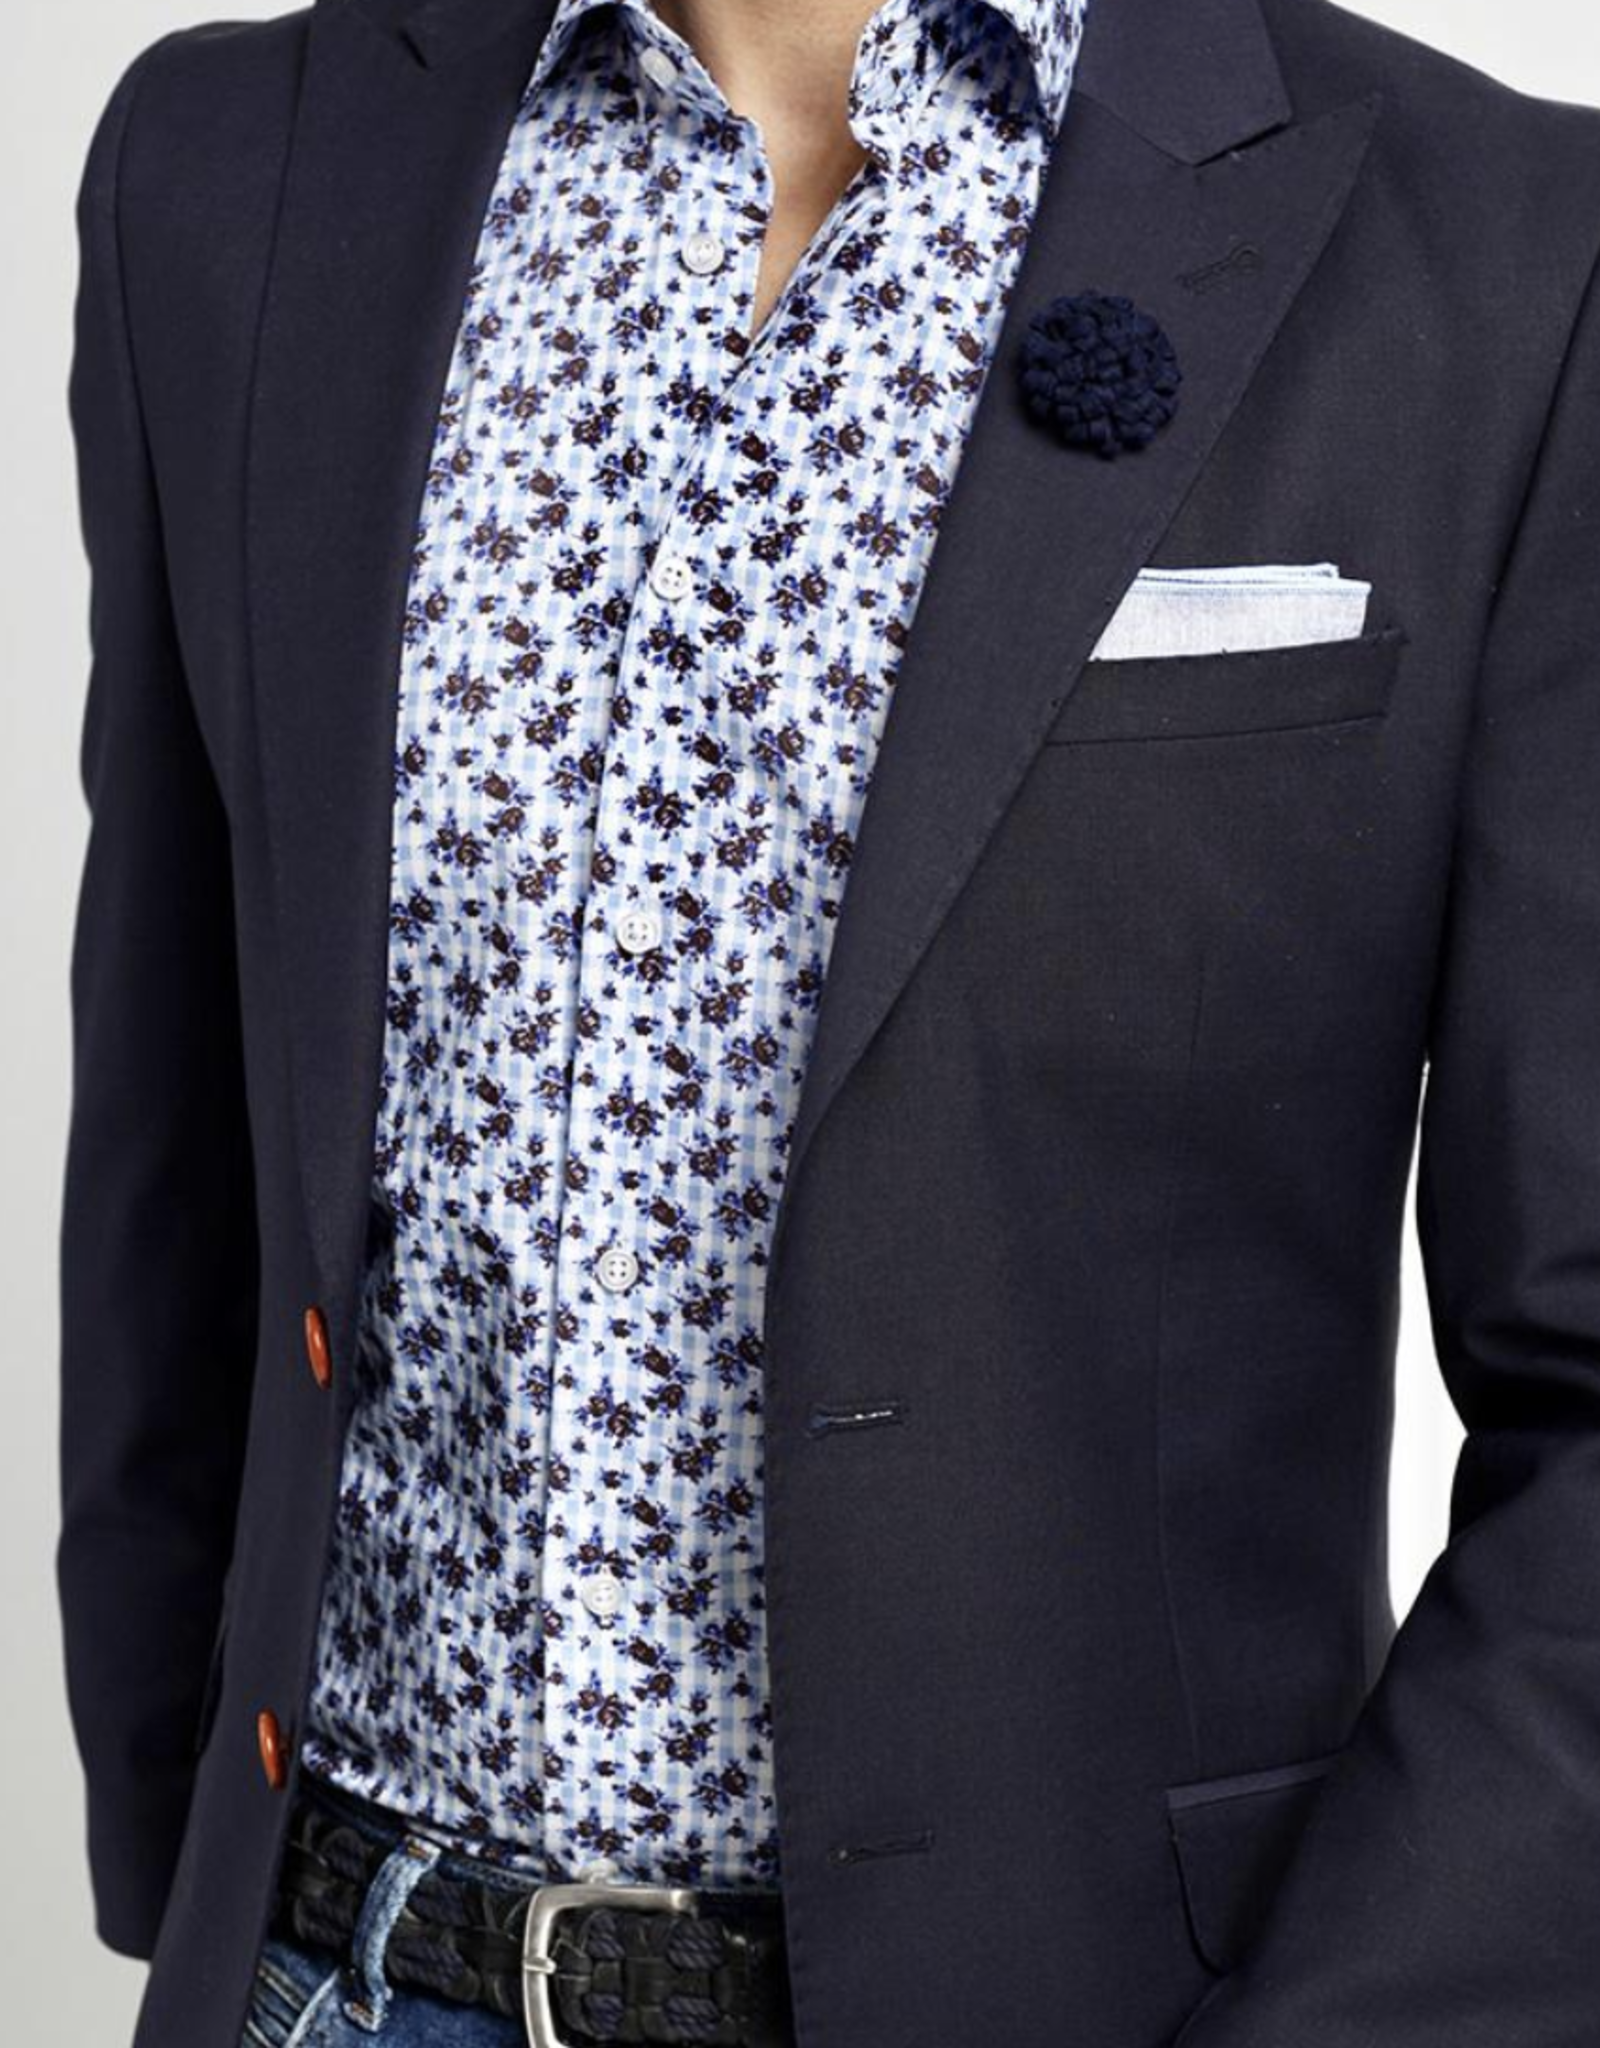 Kurt River Blue Rose Spread Shirt